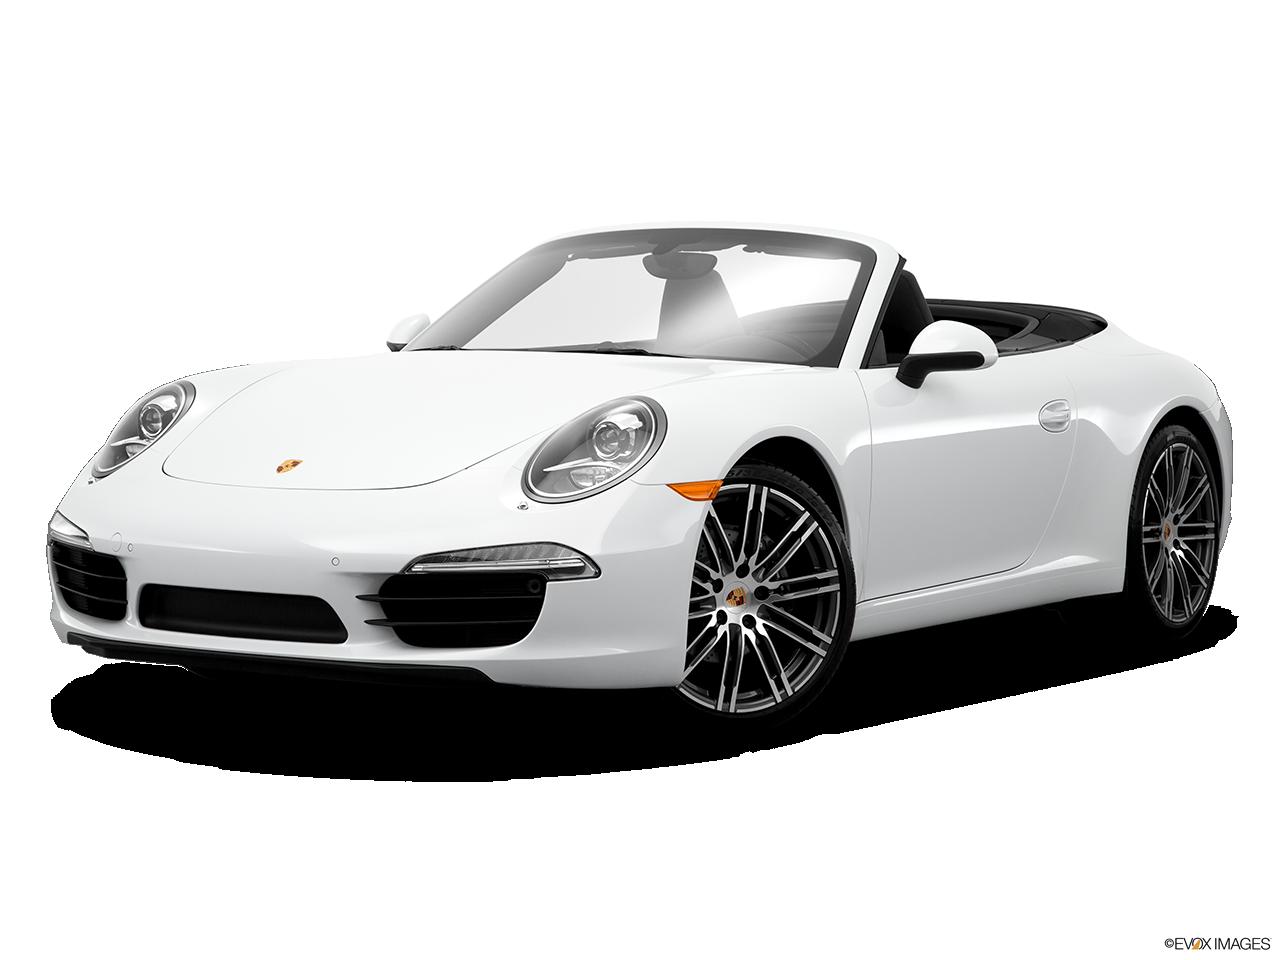 Porsche PNG Image - Porsche HD PNG